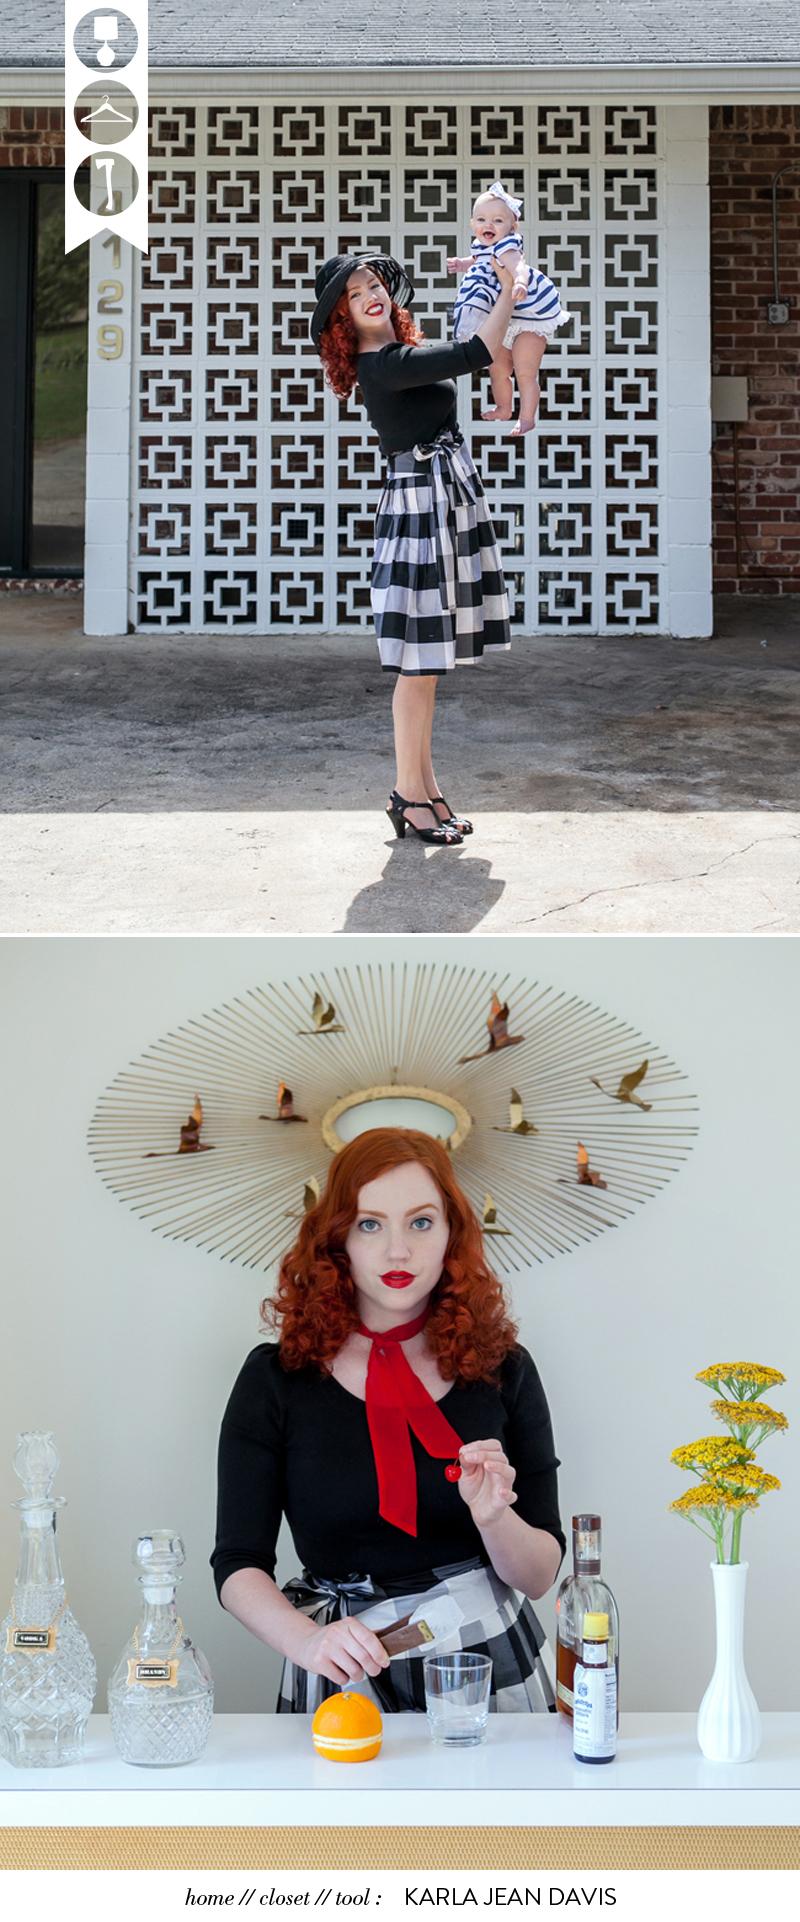 Karla Jean Davis portrait Glass and Sable Home Closet Tool Ciara Sames Jason Travis